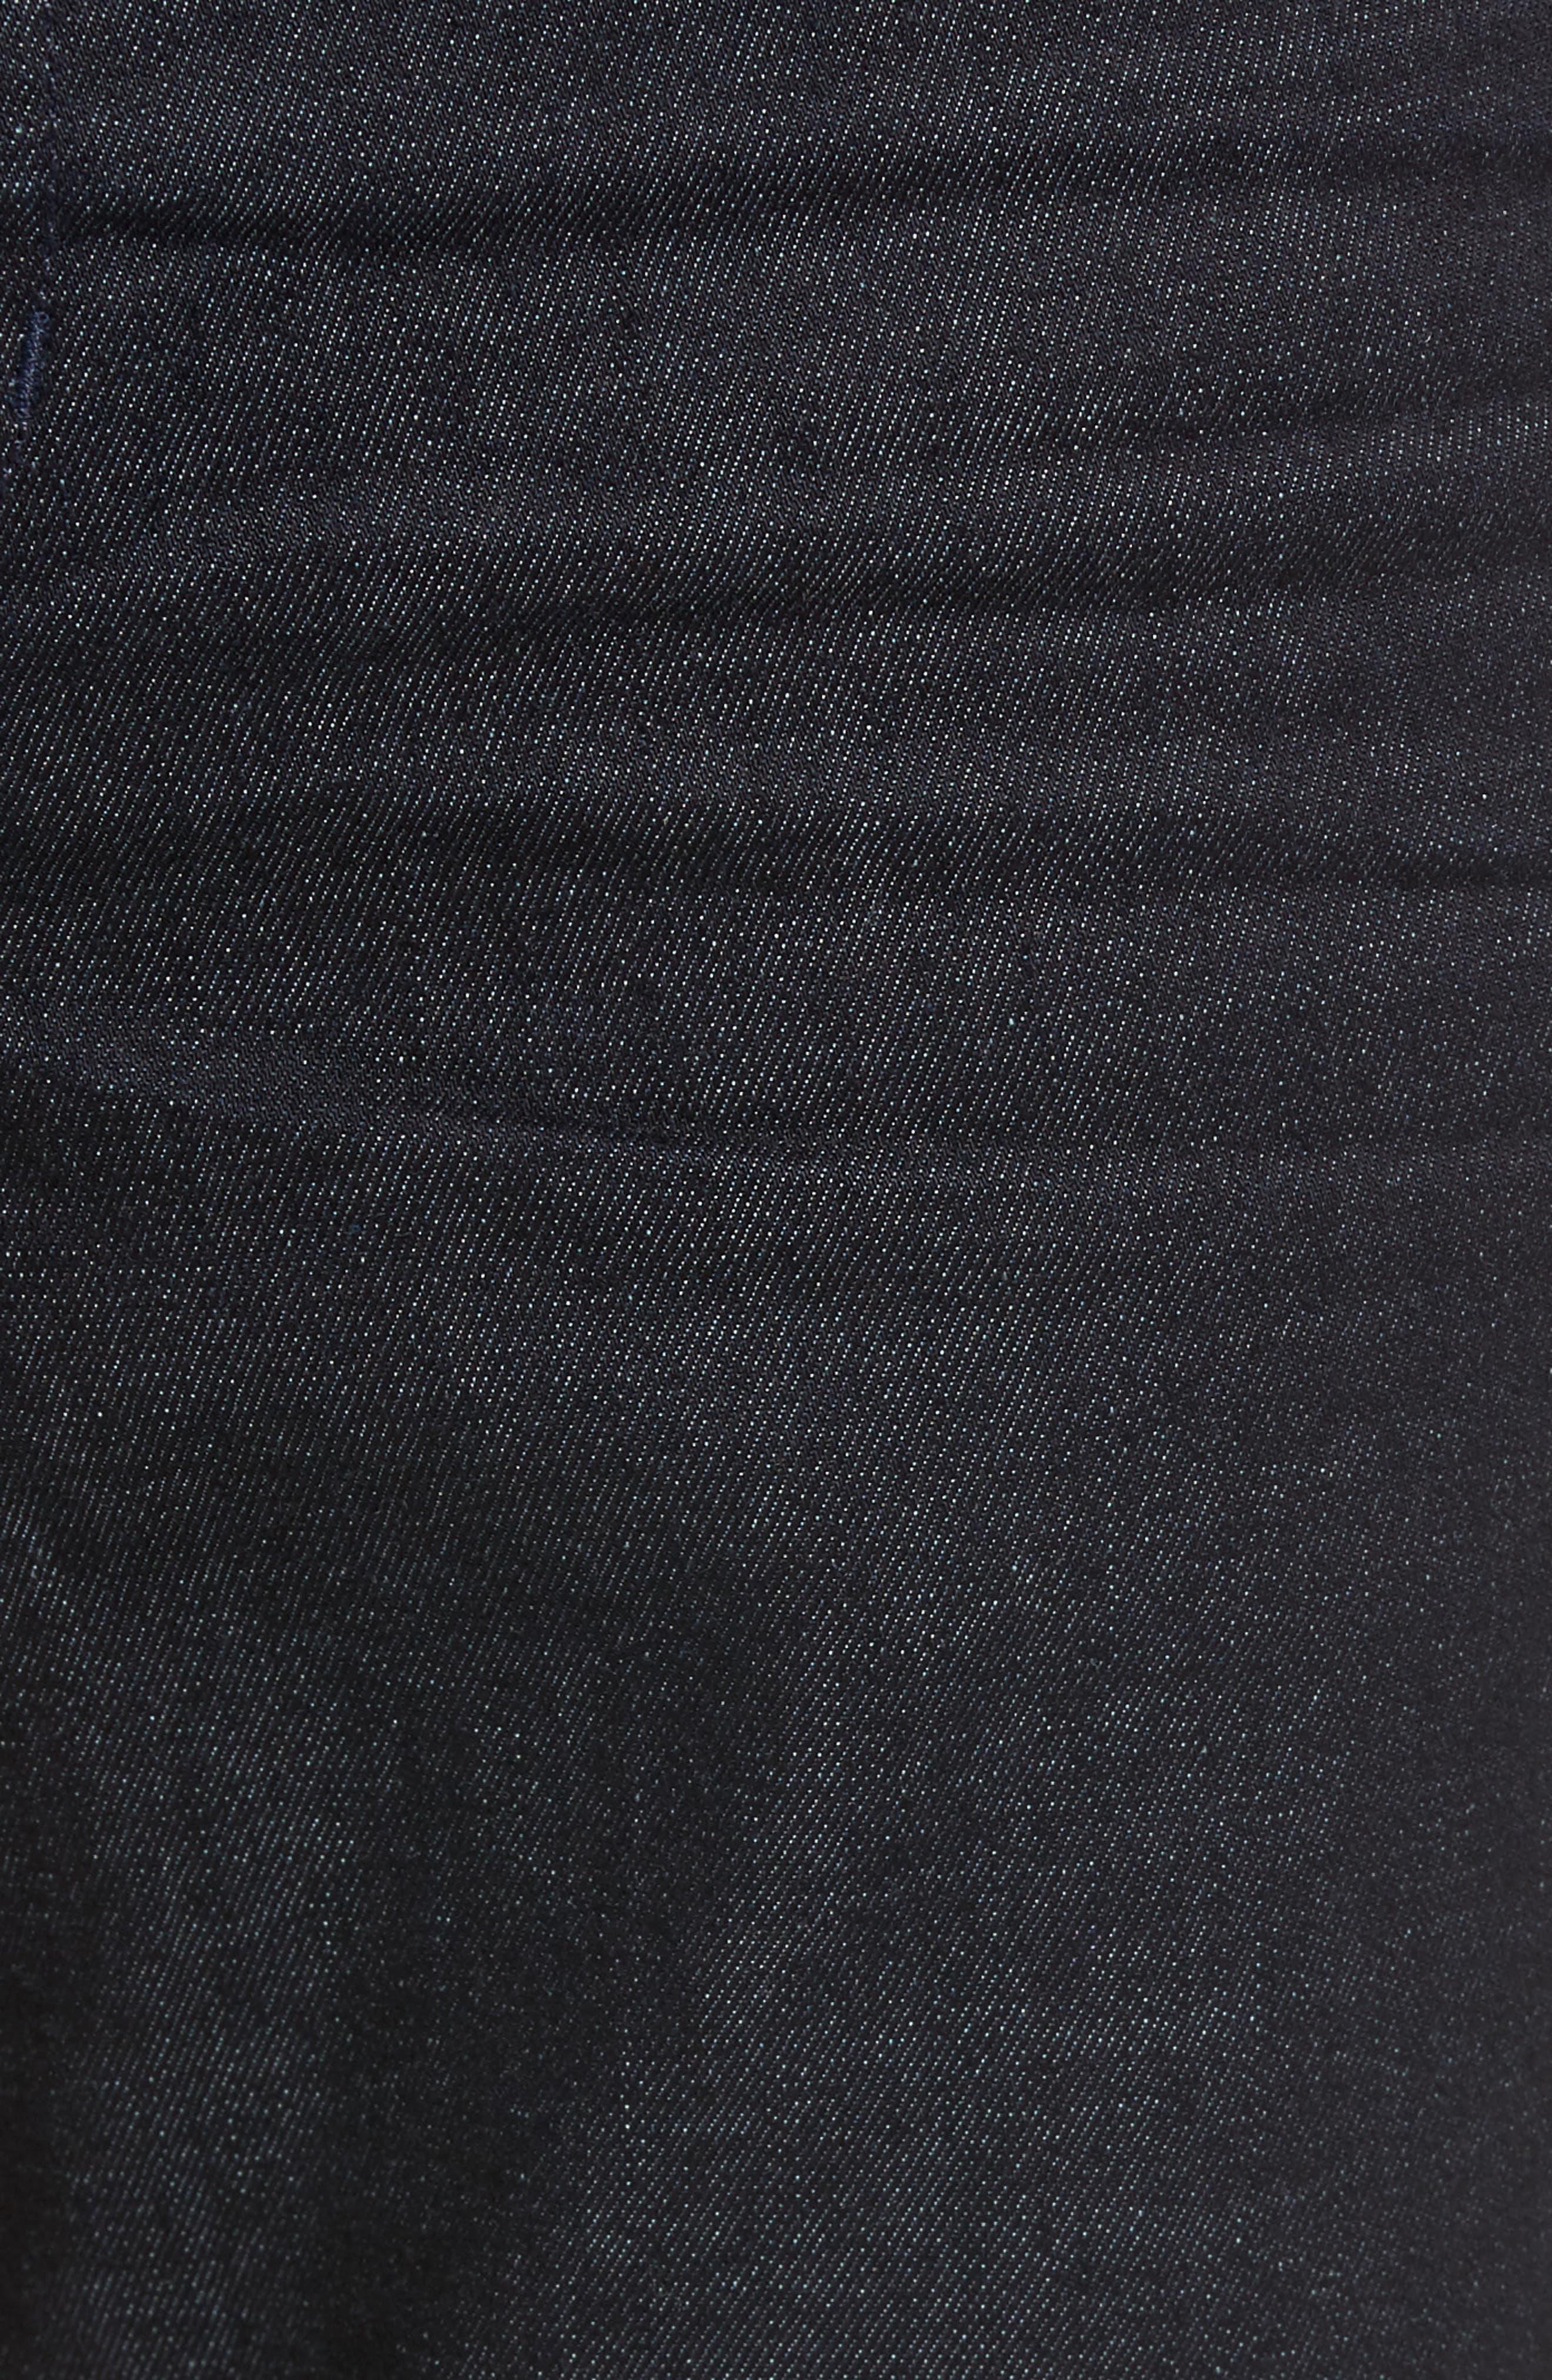 Brixton Slim Straight Fit Jeans,                             Alternate thumbnail 5, color,